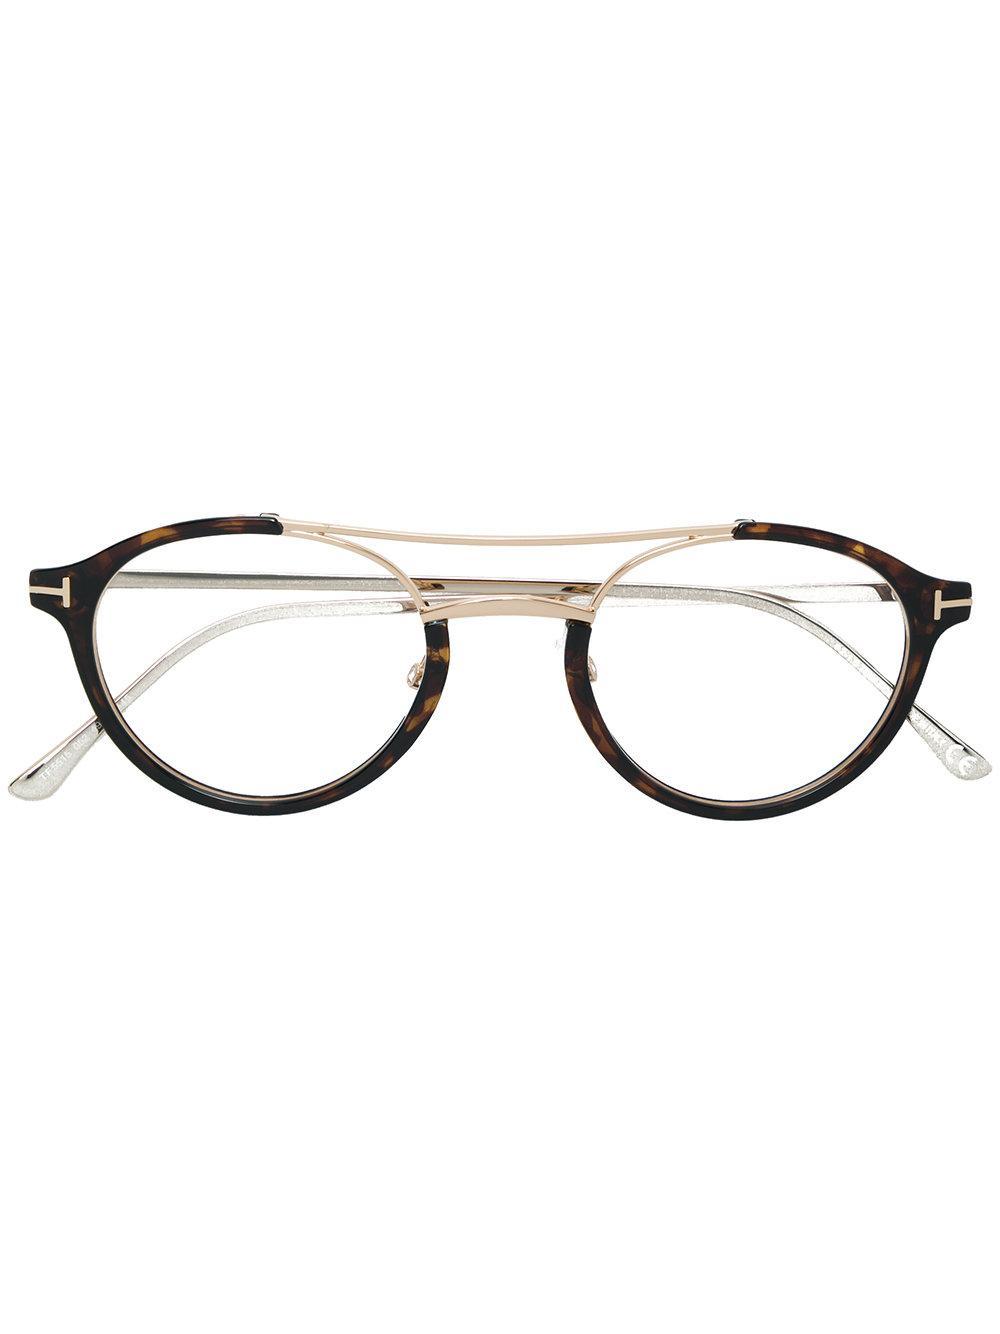 5998975a7839 Tom Ford Eyewear Round Frame Glasses - Brown